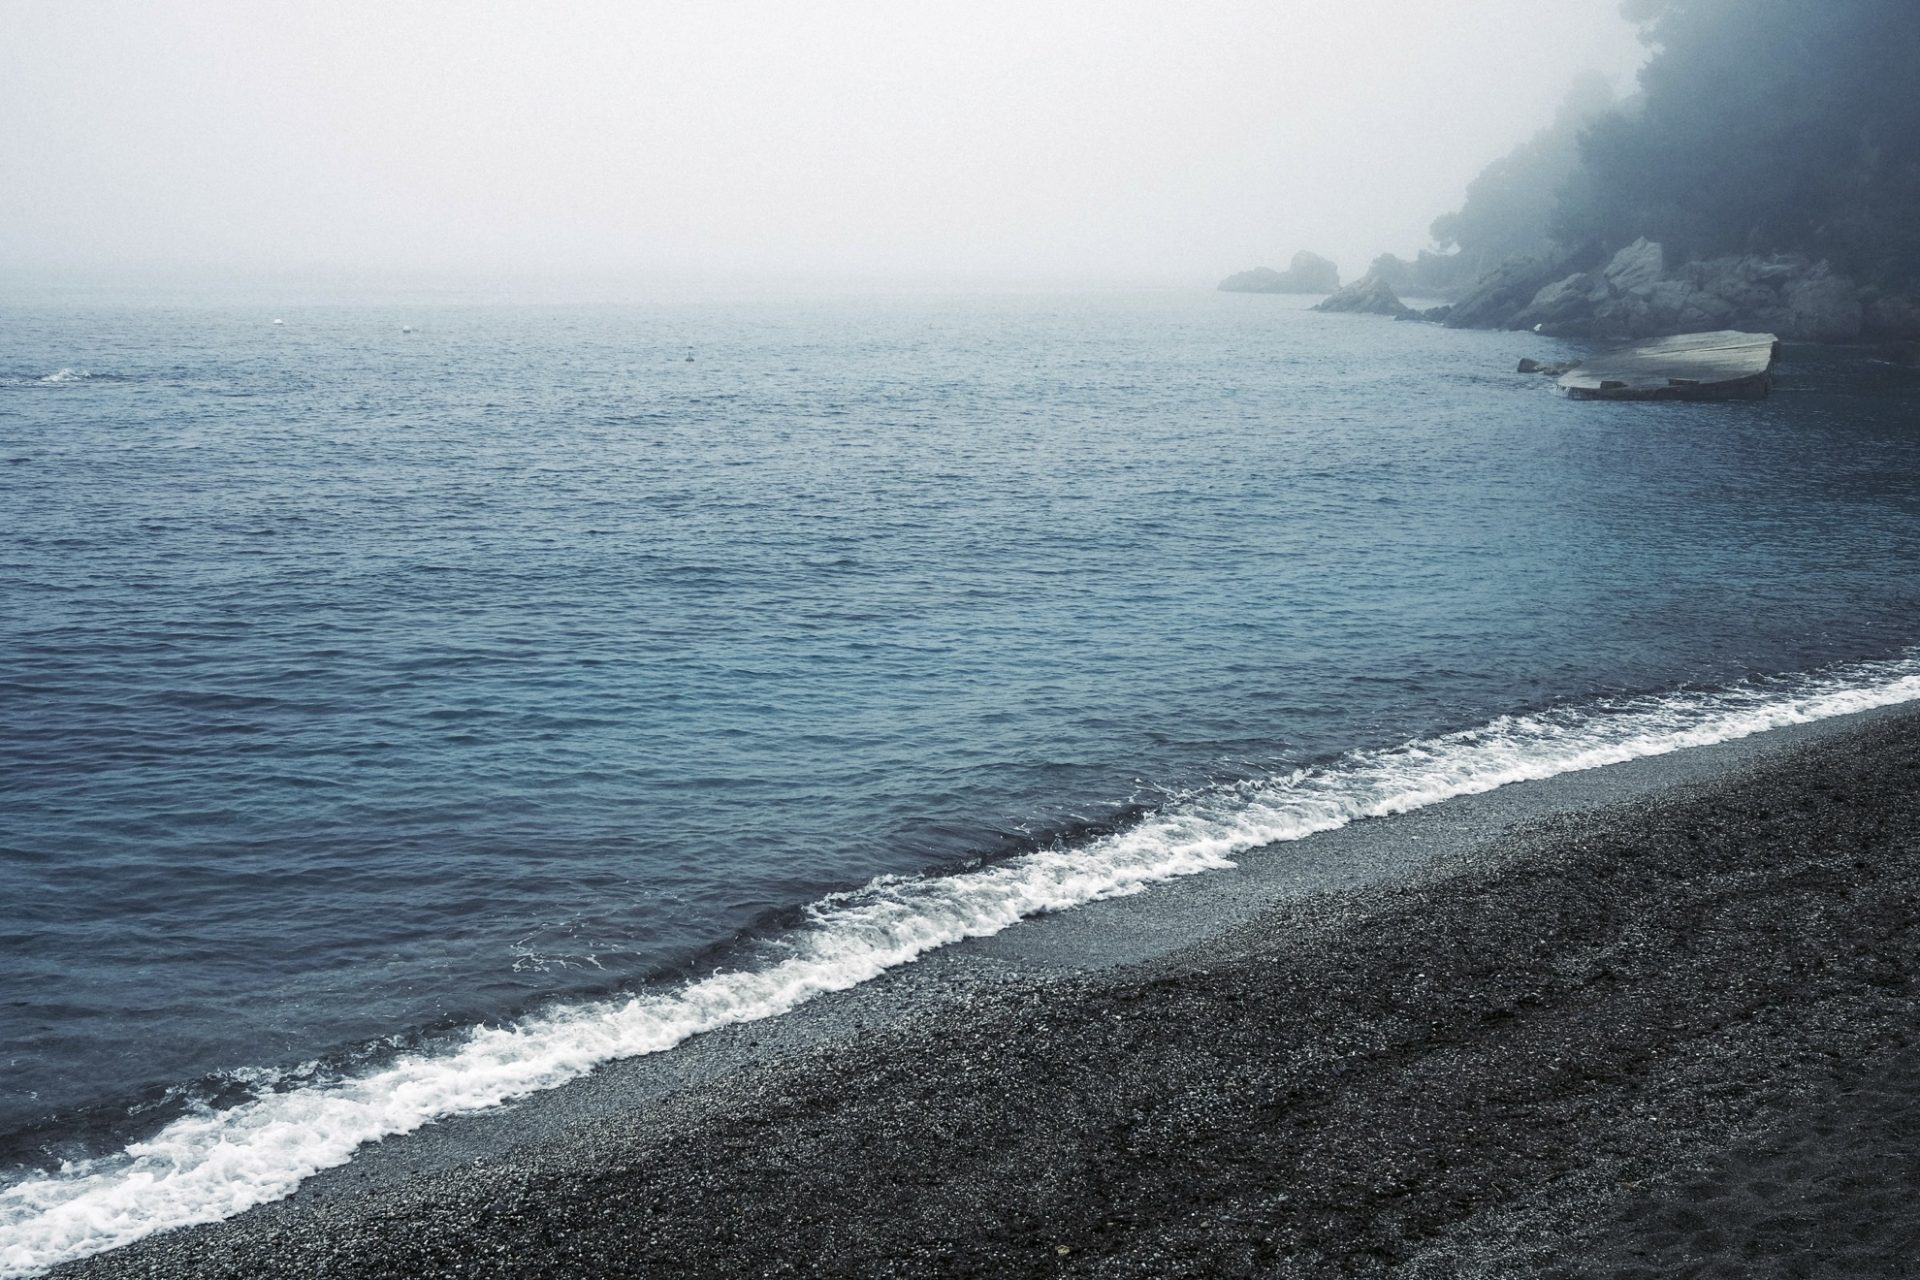 Fuji X100v pin de galle fog @laurentparienti-5